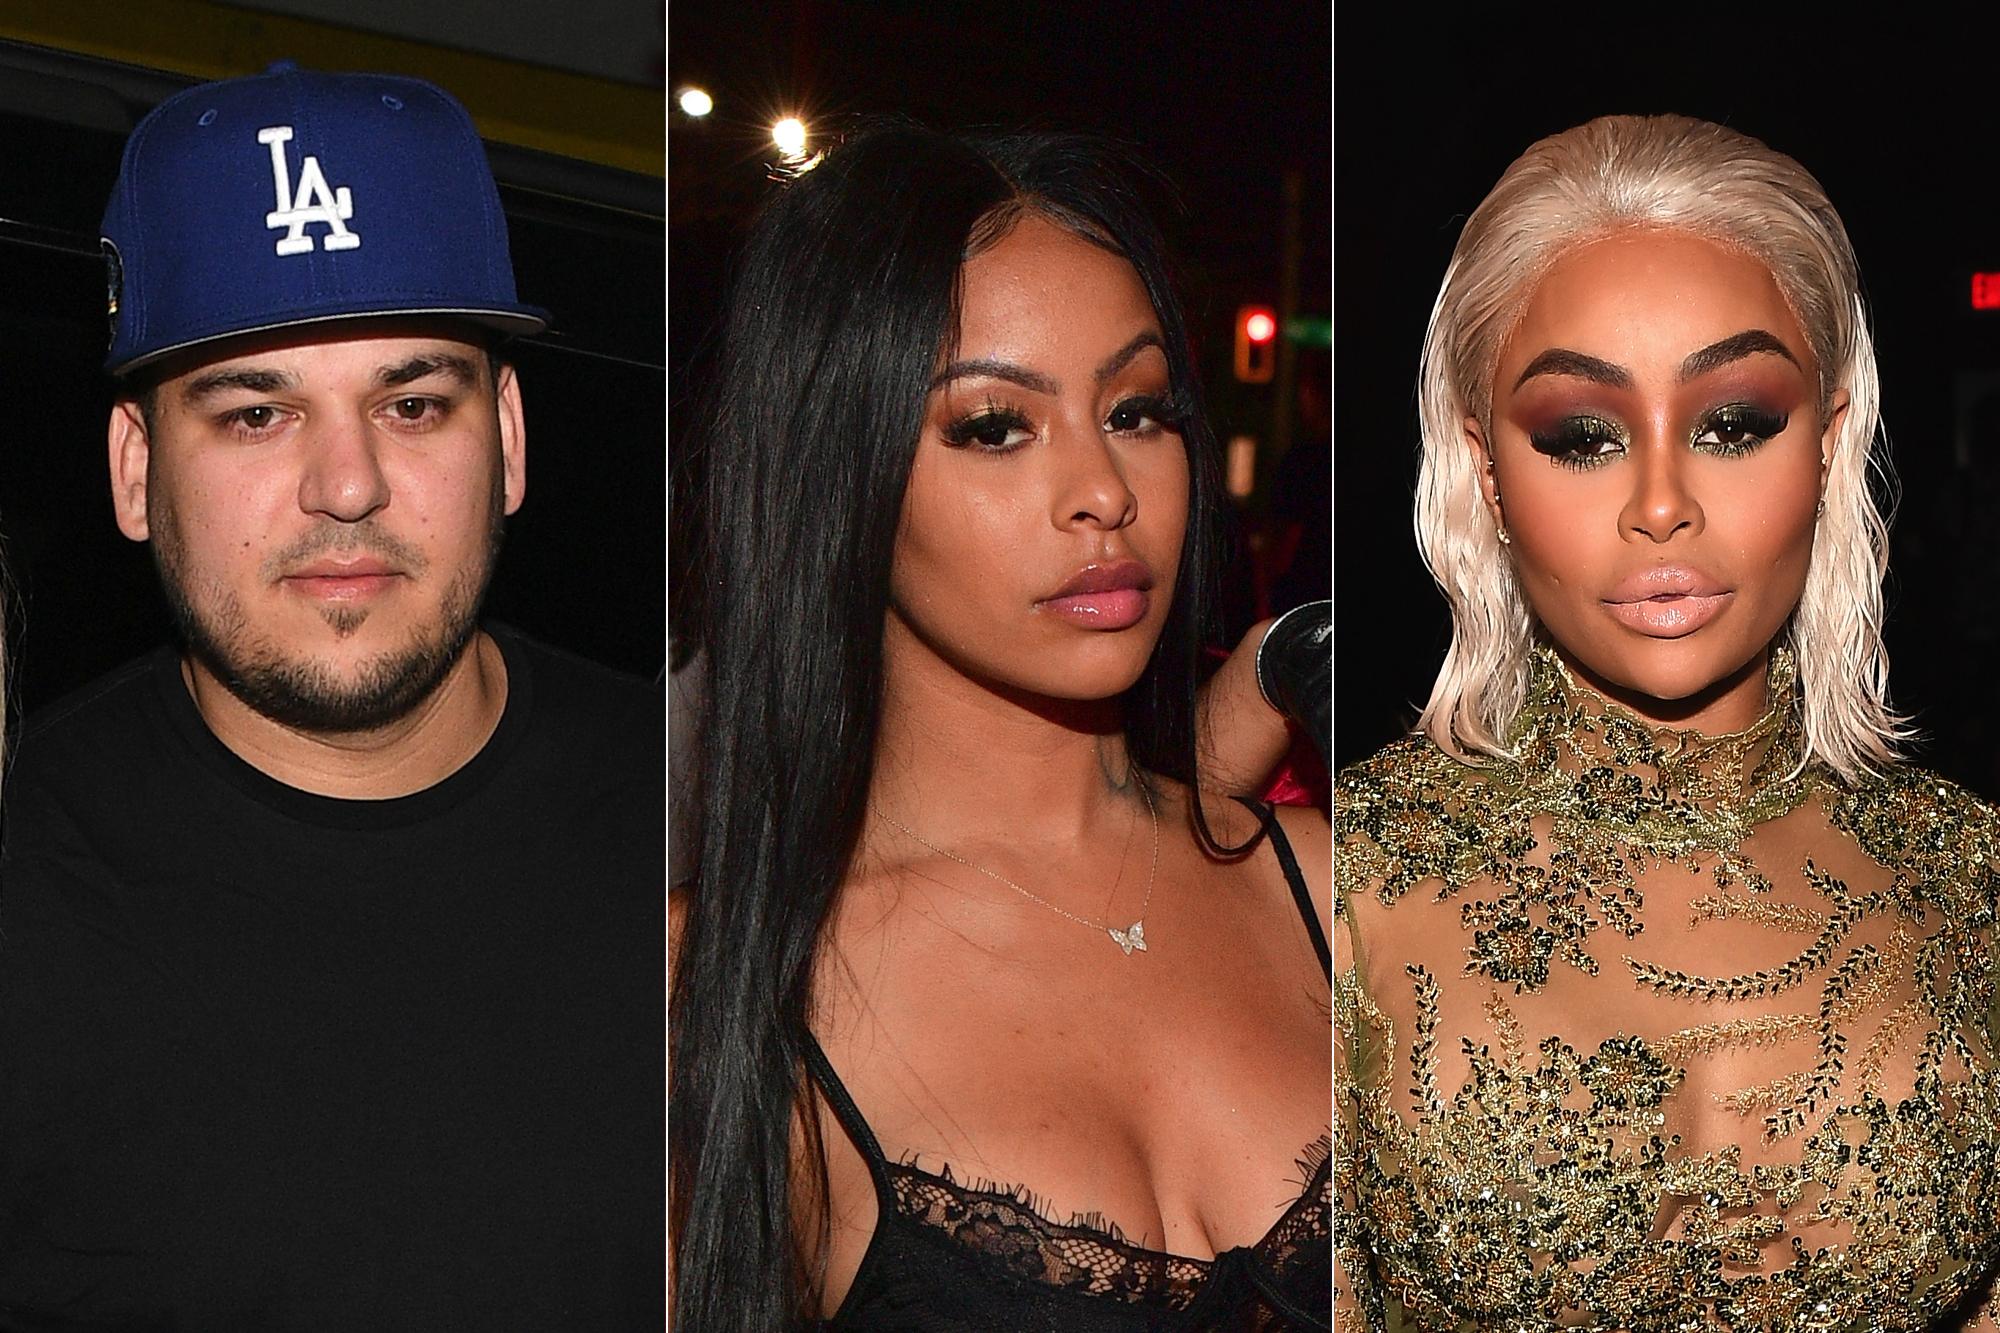 Rob Kardashian Reportedly Wants Full Custody Of Dream Kardashian Following Blac Chyna's Hawaii Scandal With Kid Buu